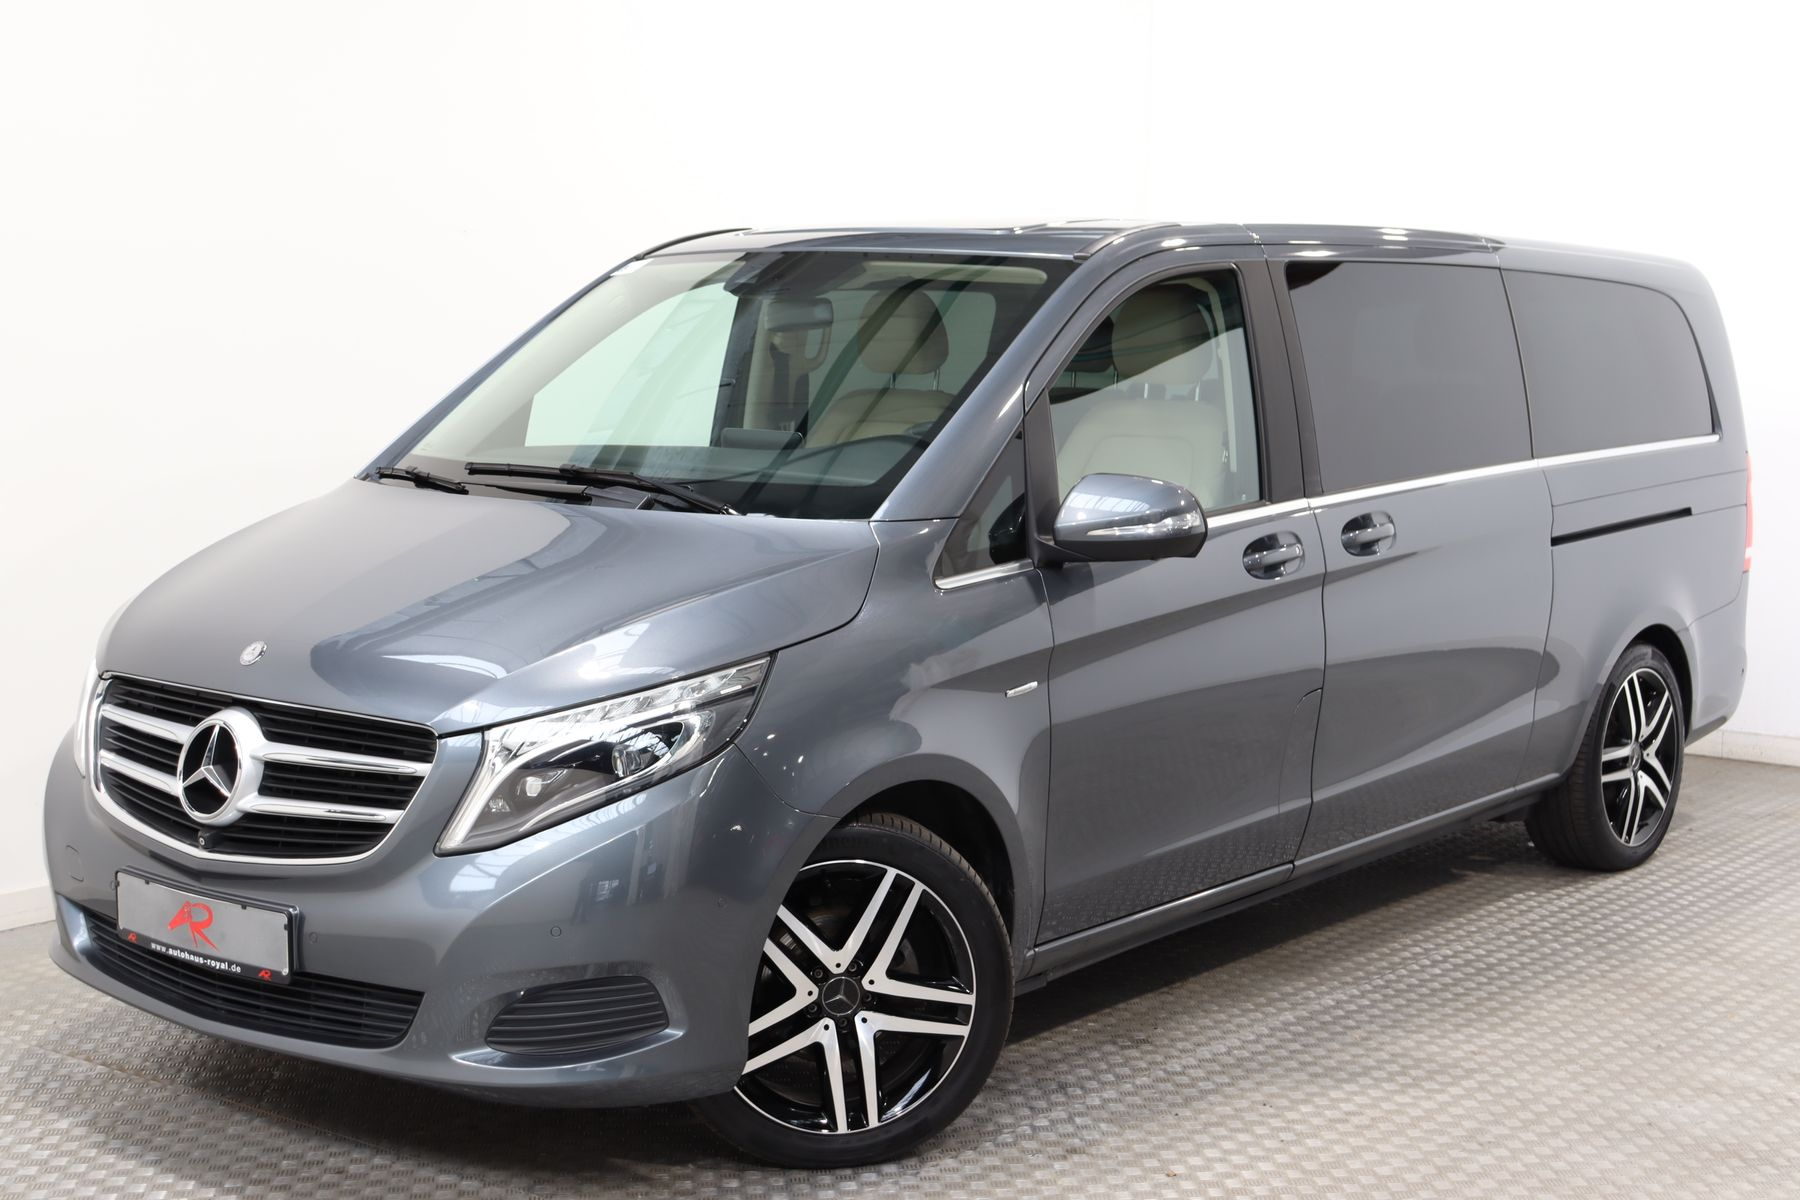 Mercedes-Benz V 220 d EXTRALANG 6 SITZE AVANTGARDE EDITION,19Z, Jahr 2015, Diesel